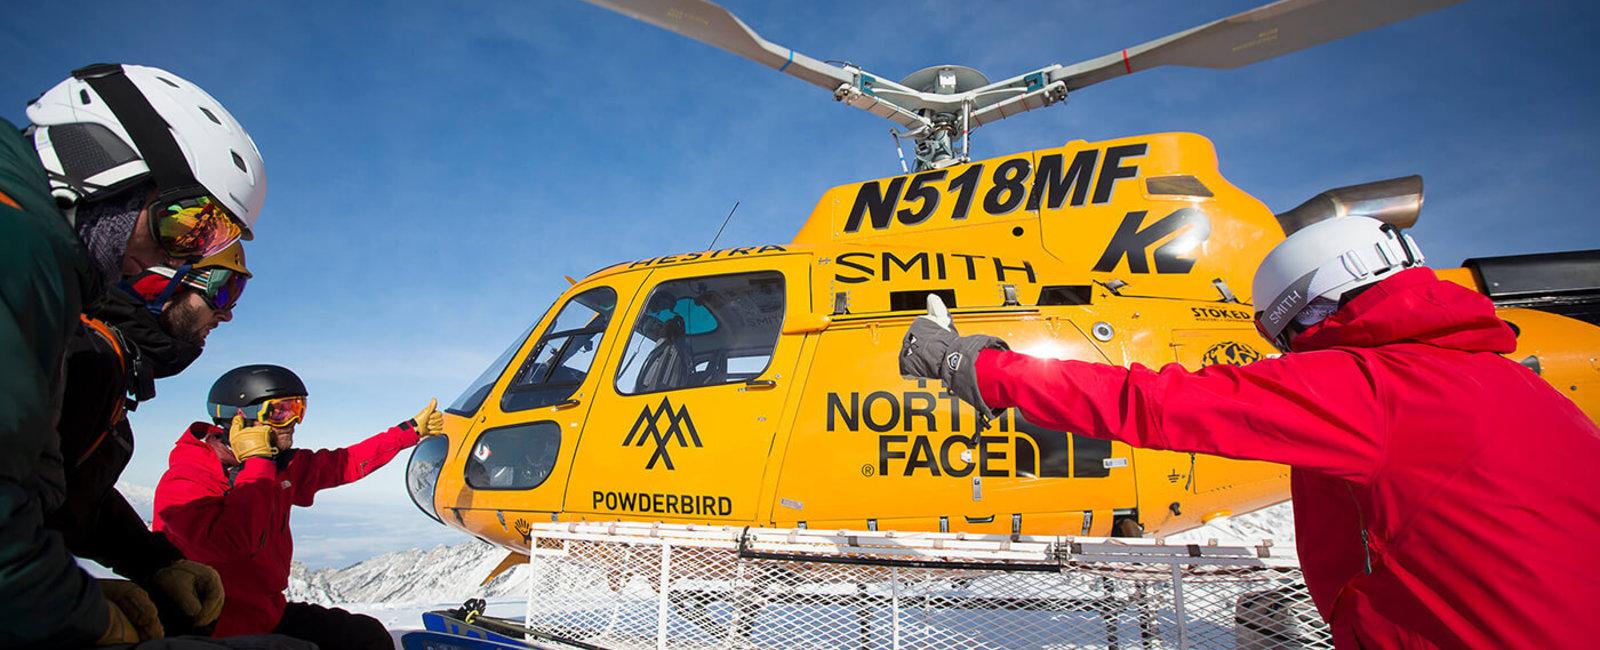 Powderbird Helicopter Skiing